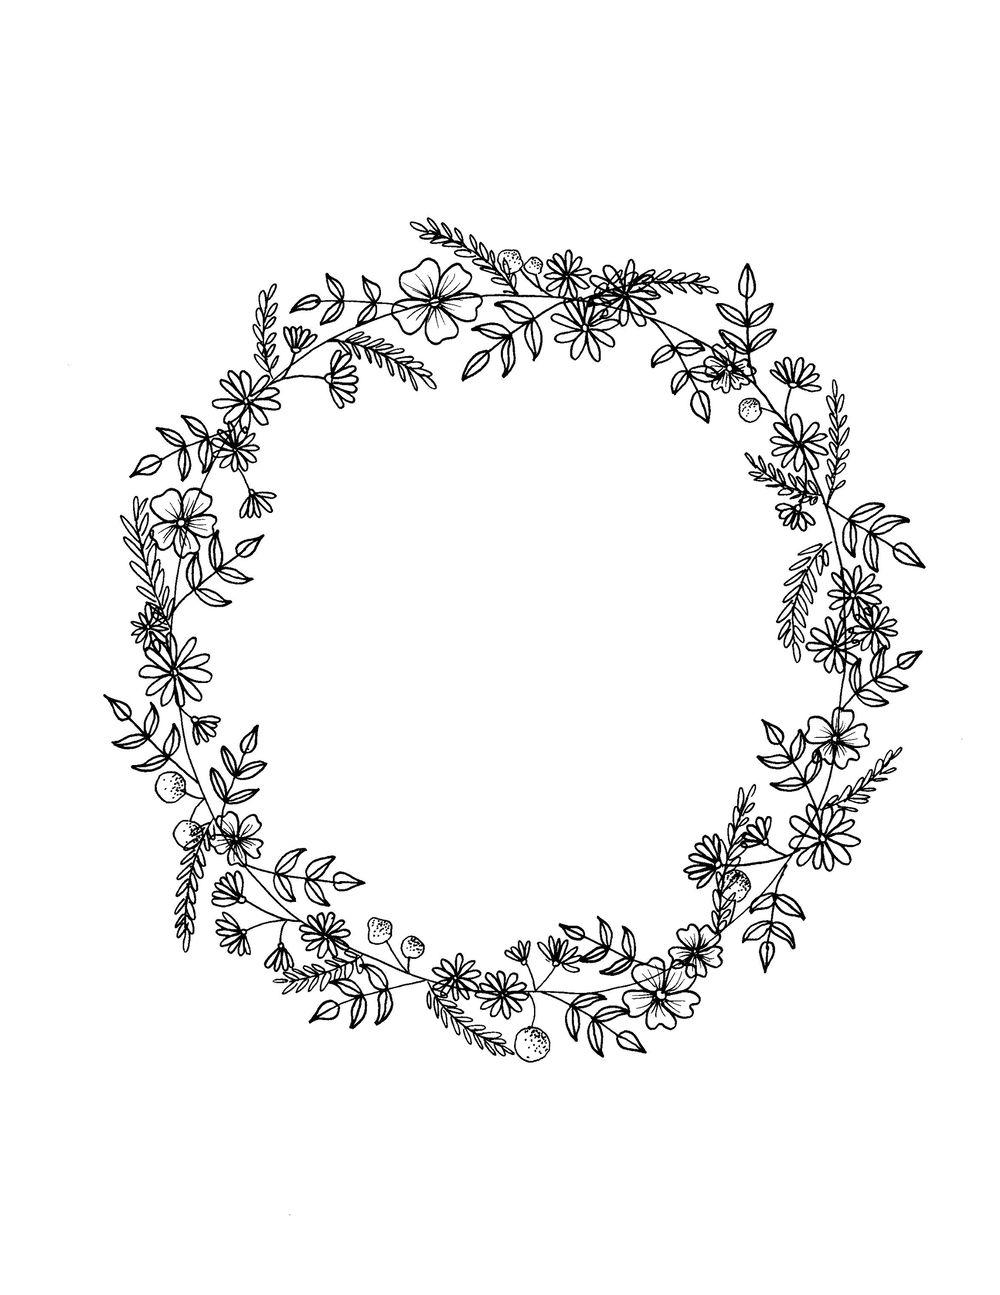 flower and leaf doodles - image 3 - student project